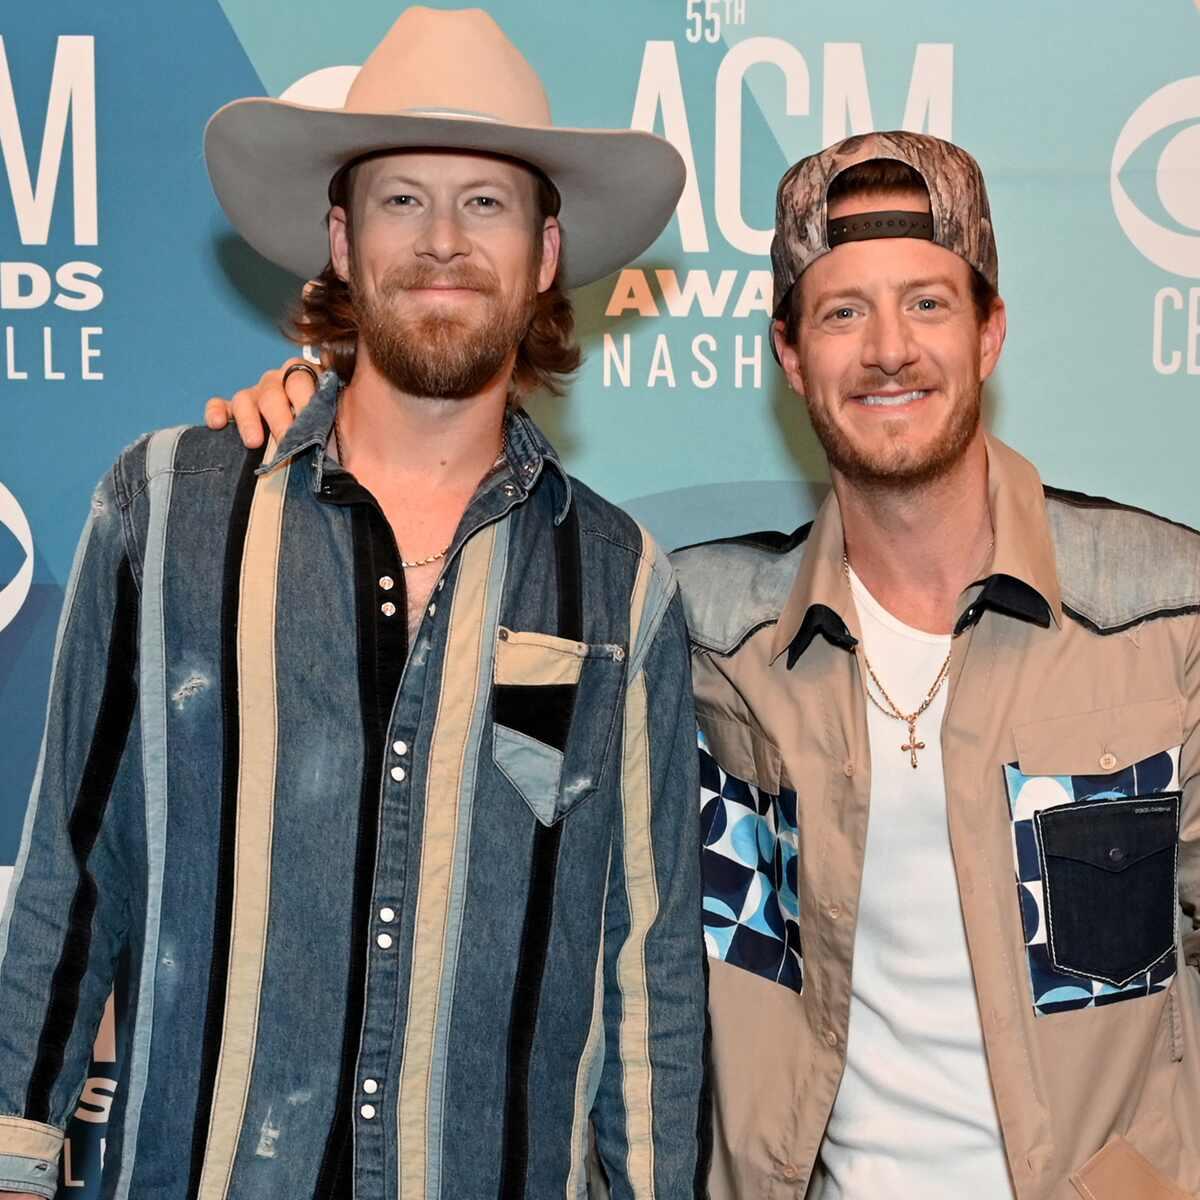 Brian Kelley, Tyler Hubbard, Florida Georgia Line, 2020 Academy of Country Music Awards, 2020 ACM Awards